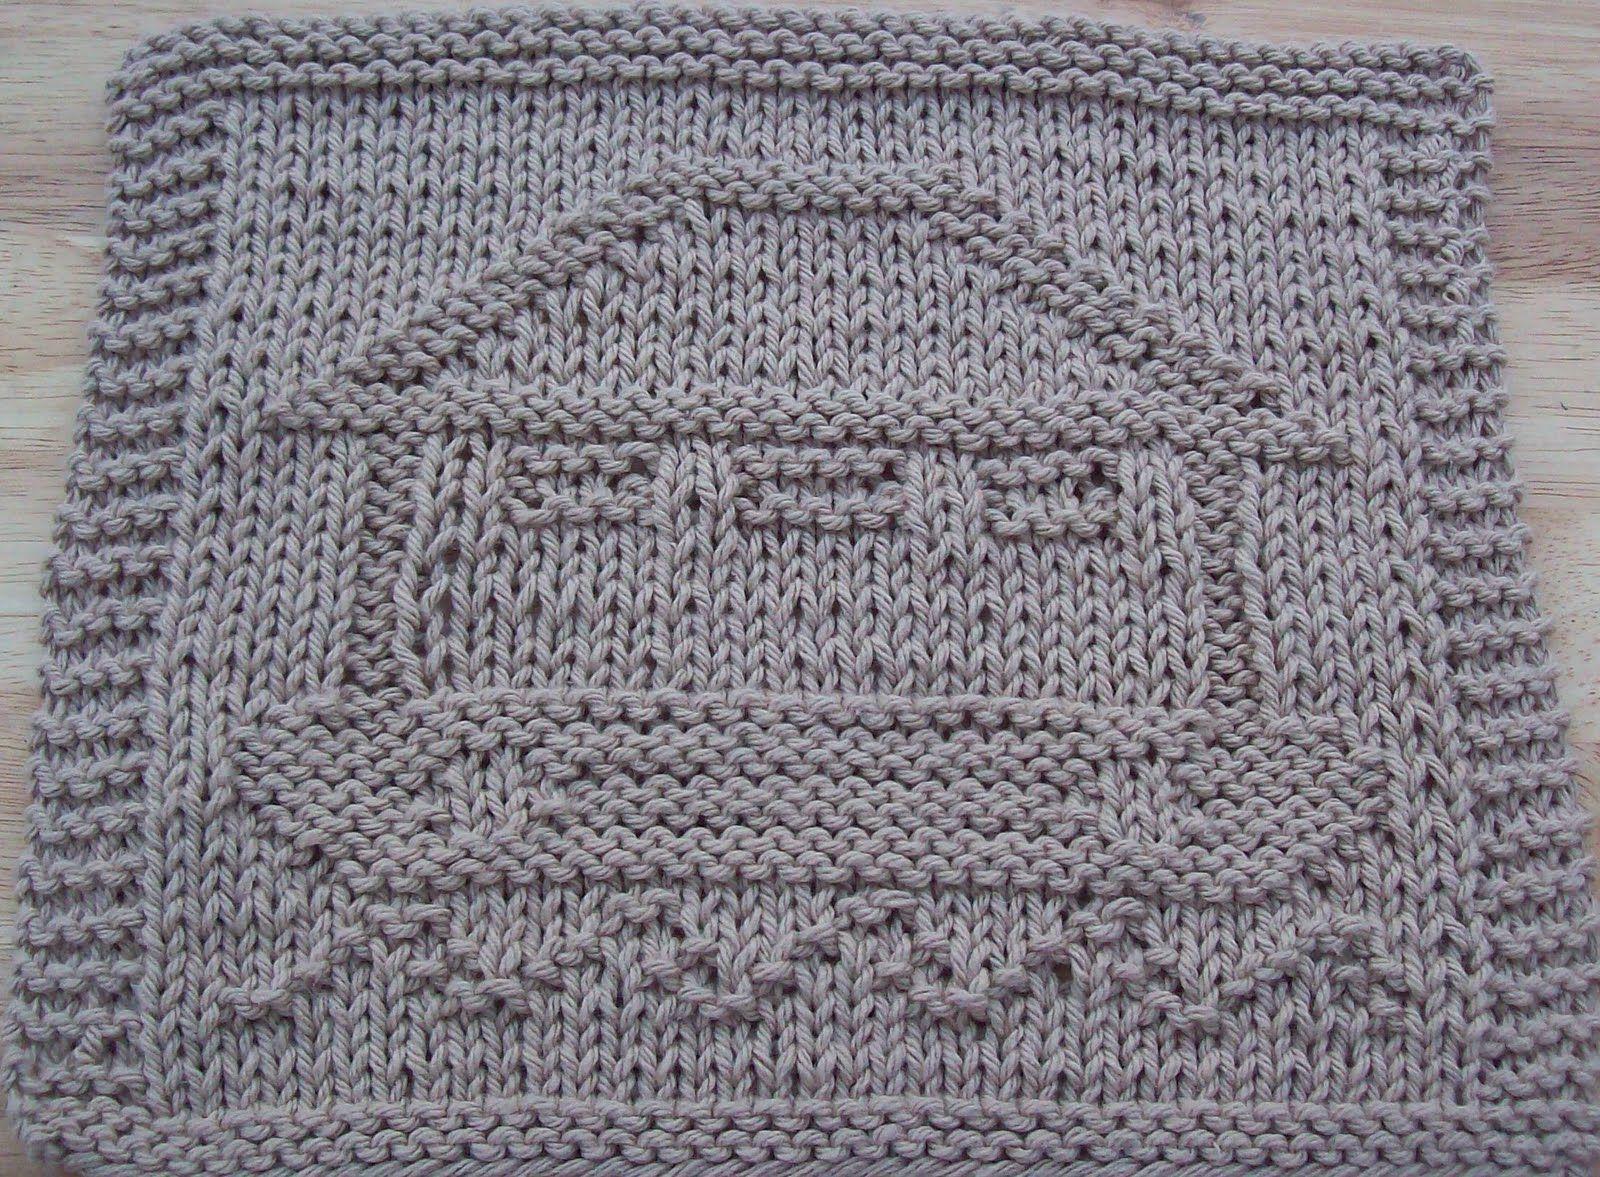 Digknitty designs noahs ark knit dishcloth pattern knit dish digknitty designs noahs ark knit dishcloth pattern bankloansurffo Gallery